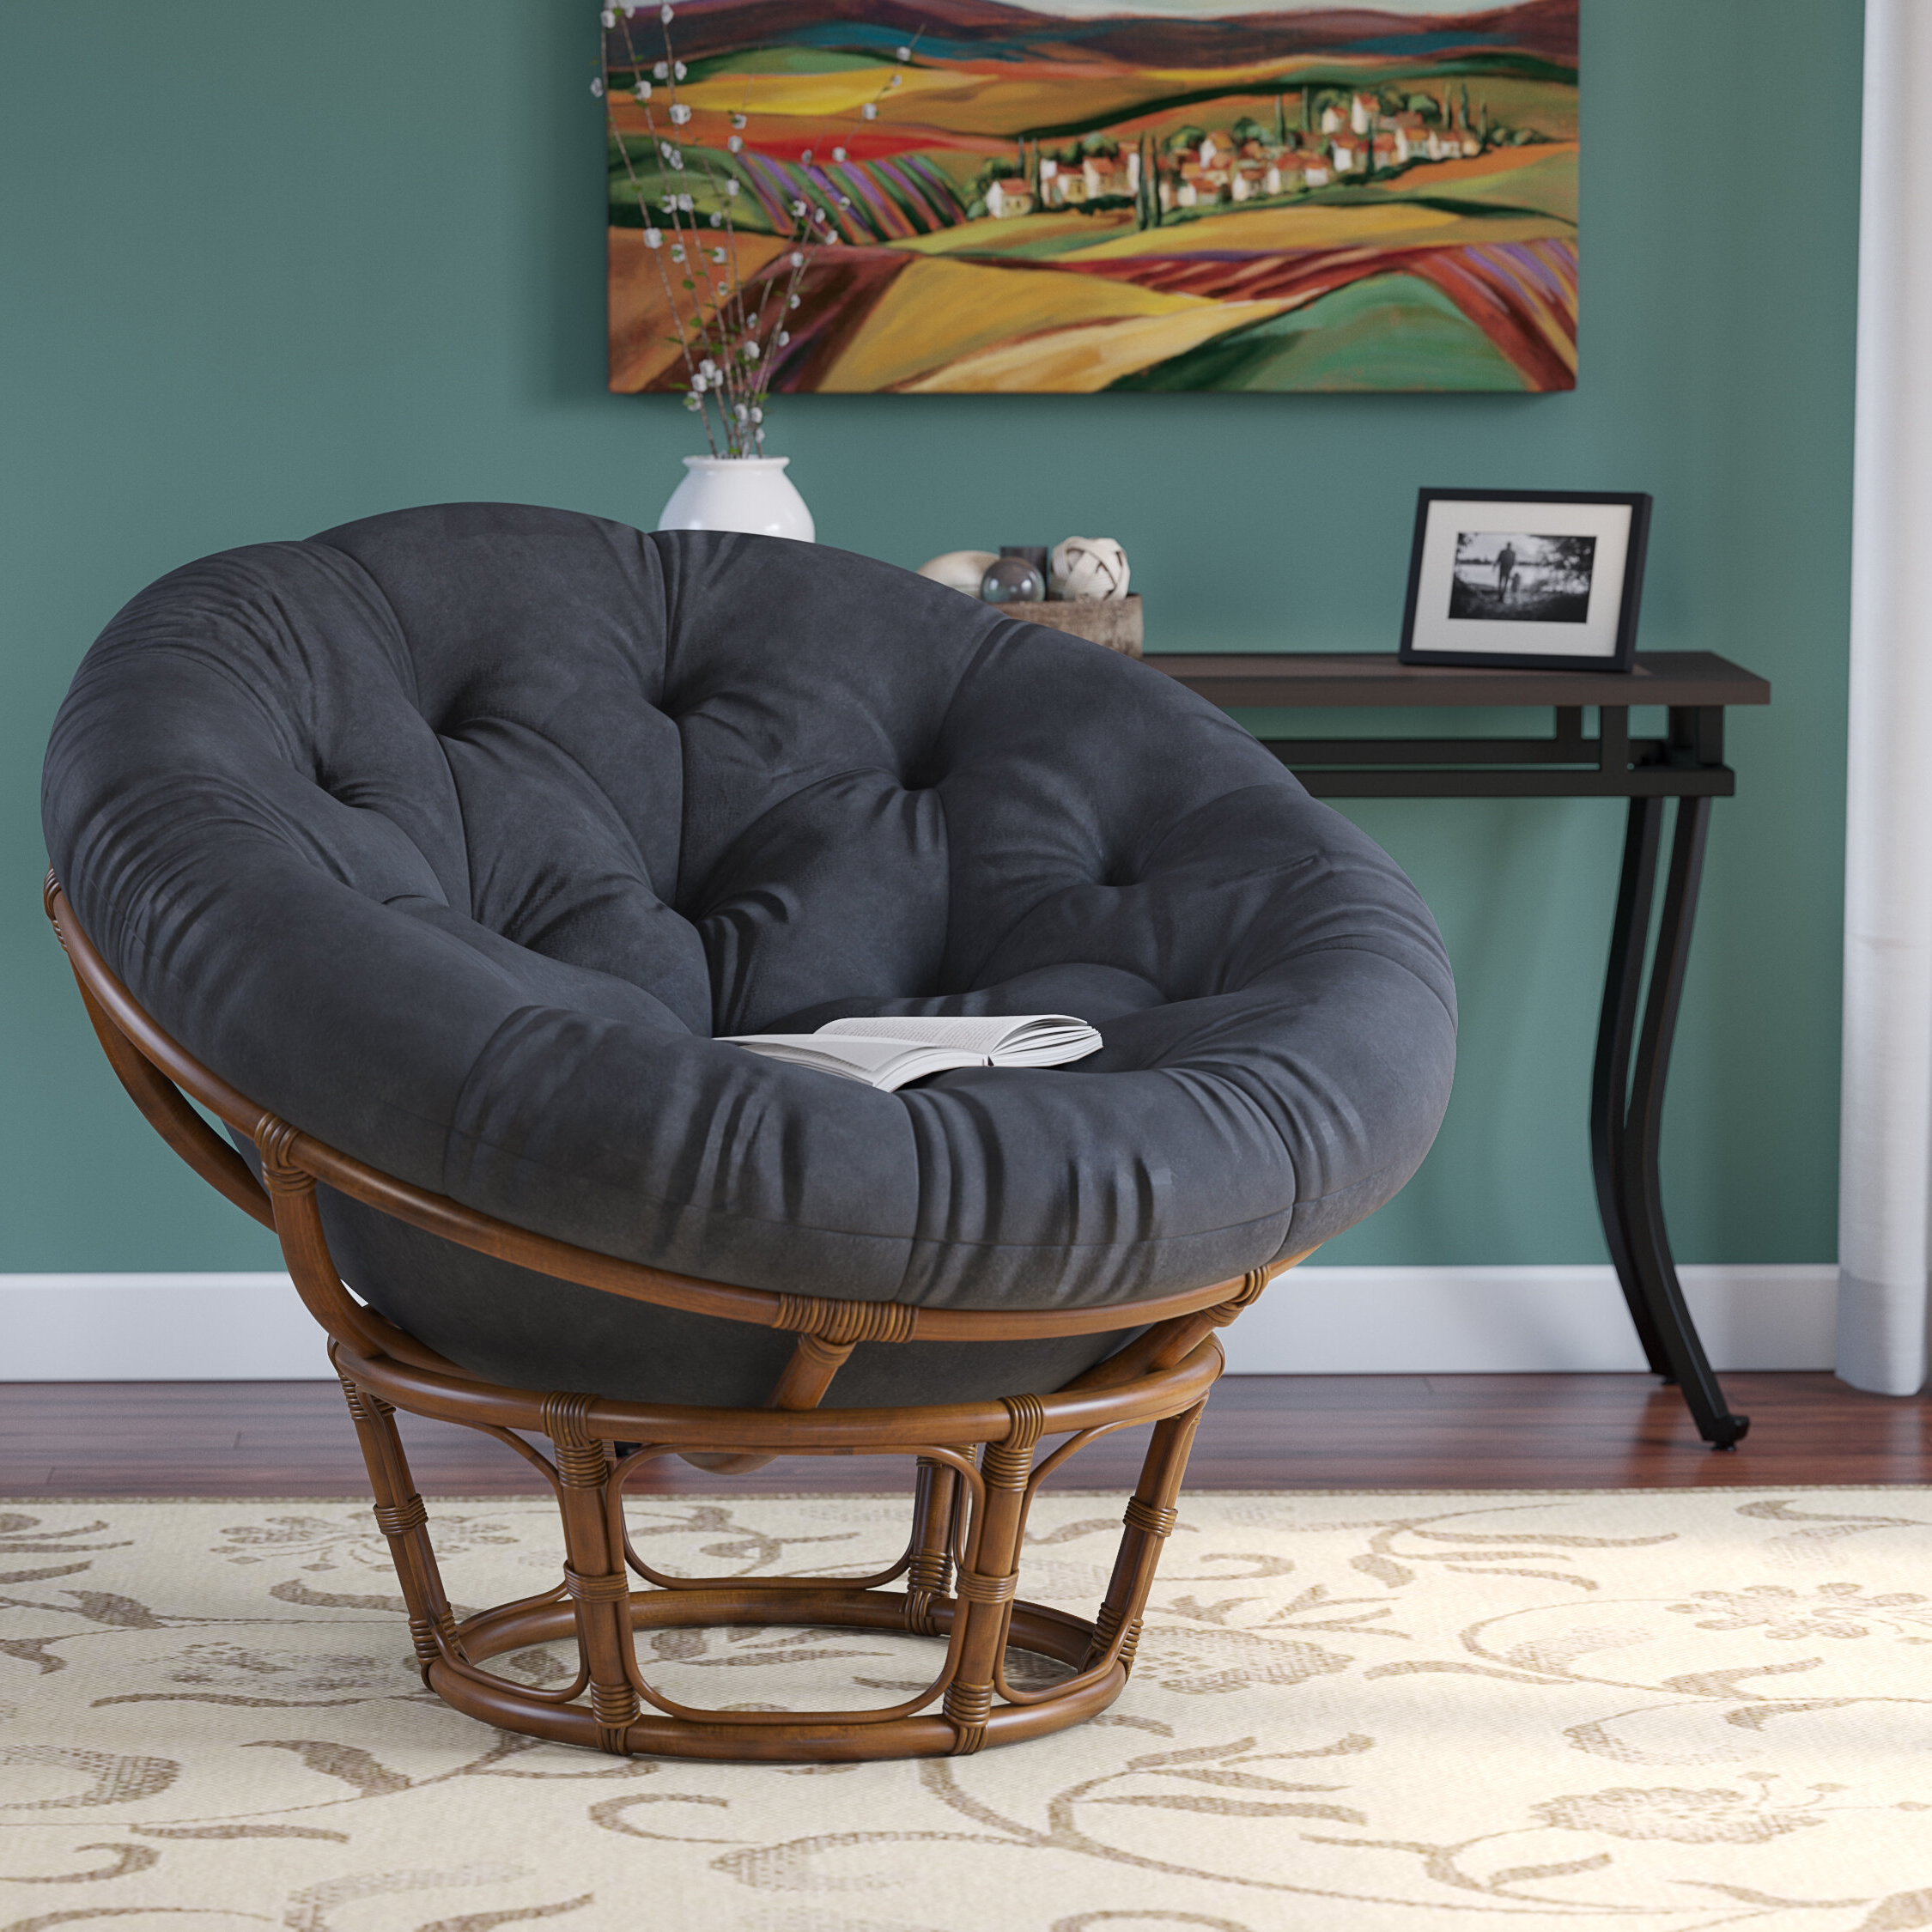 Wayfair For Latest Campton Papasan Chairs (View 4 of 20)